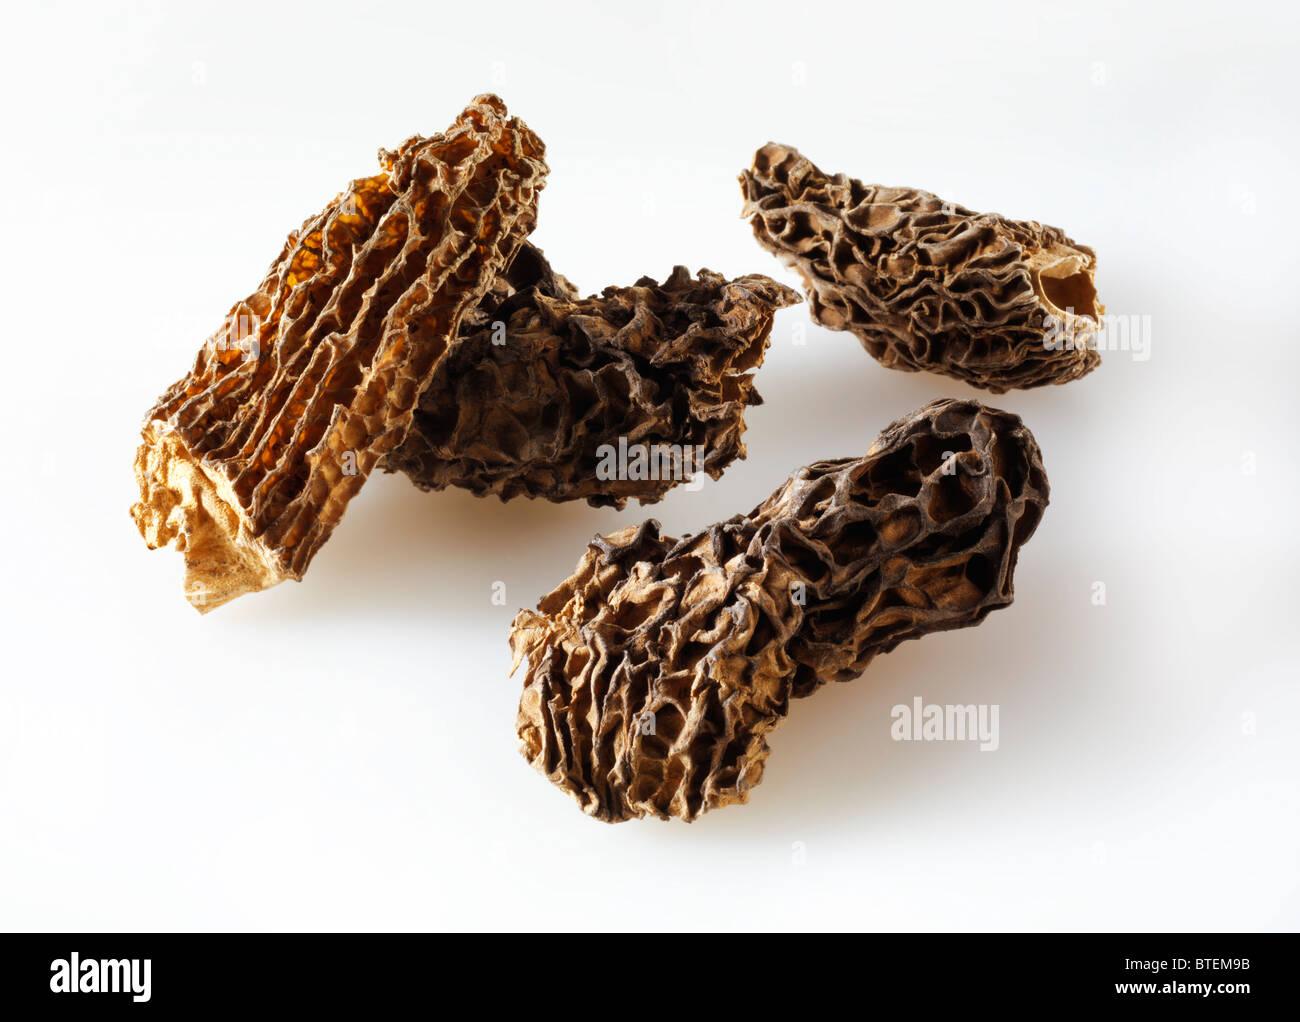 Dried Jumbo Morel mushrooms - Stock Image